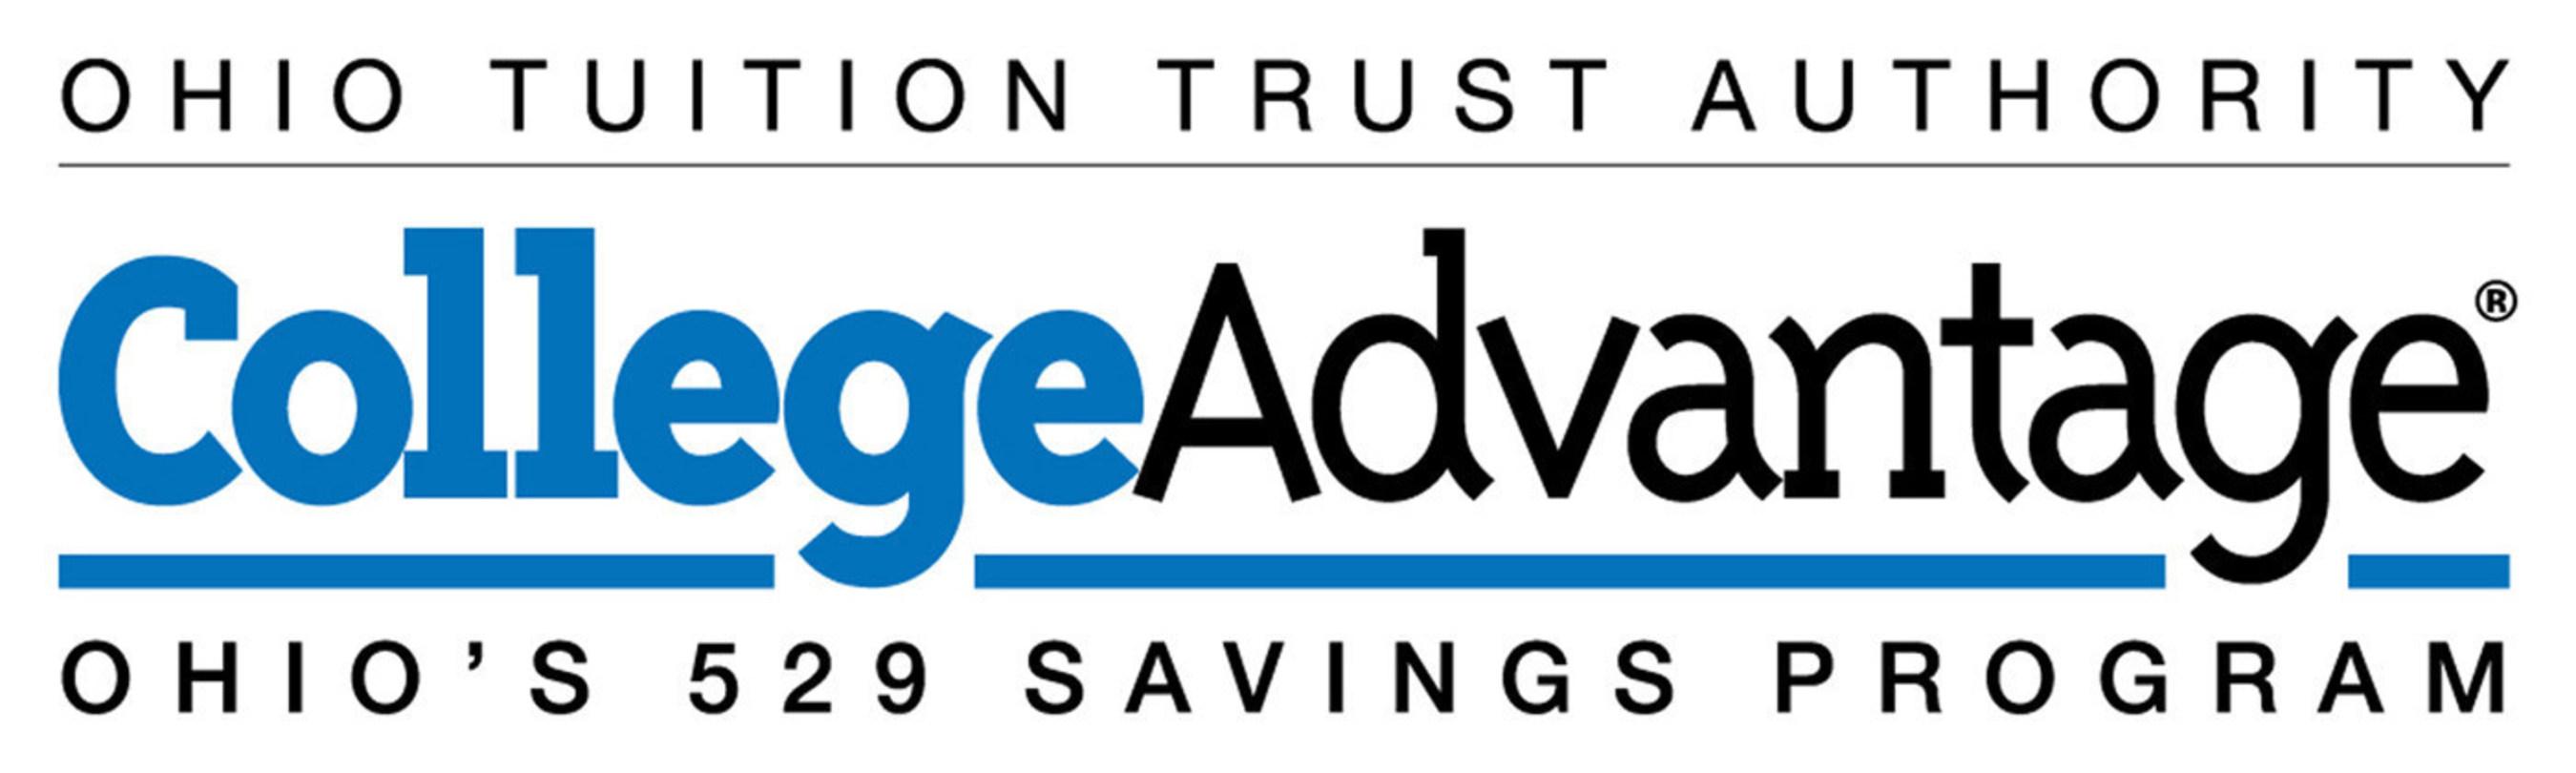 CollegeAdvantage logo